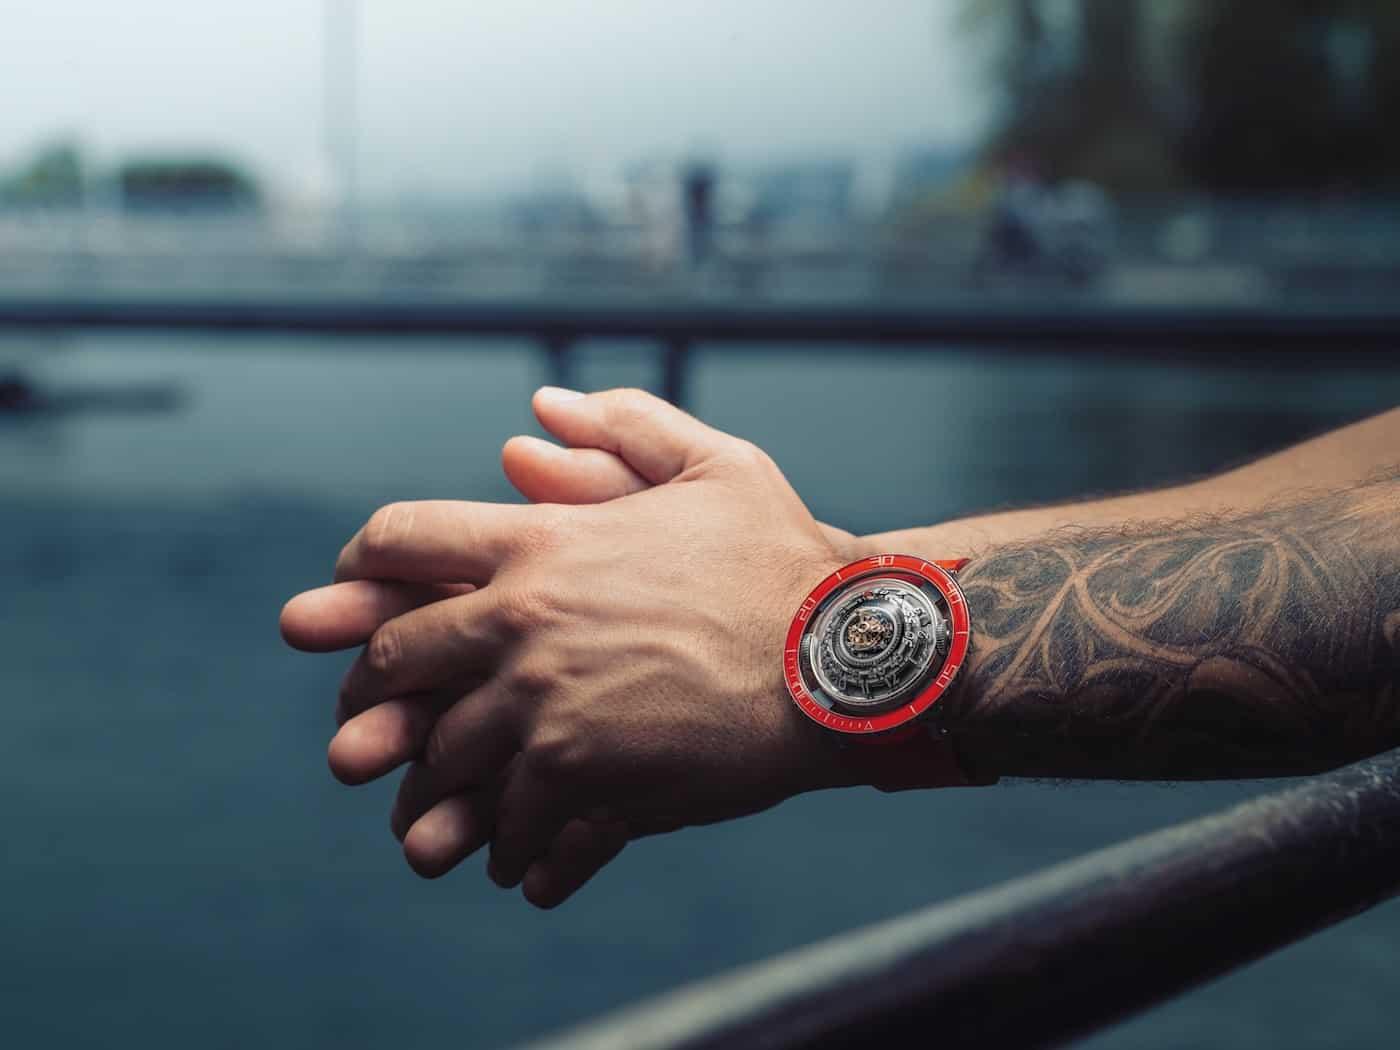 MBF HM7 Aquapod Platinum Red Watch 1